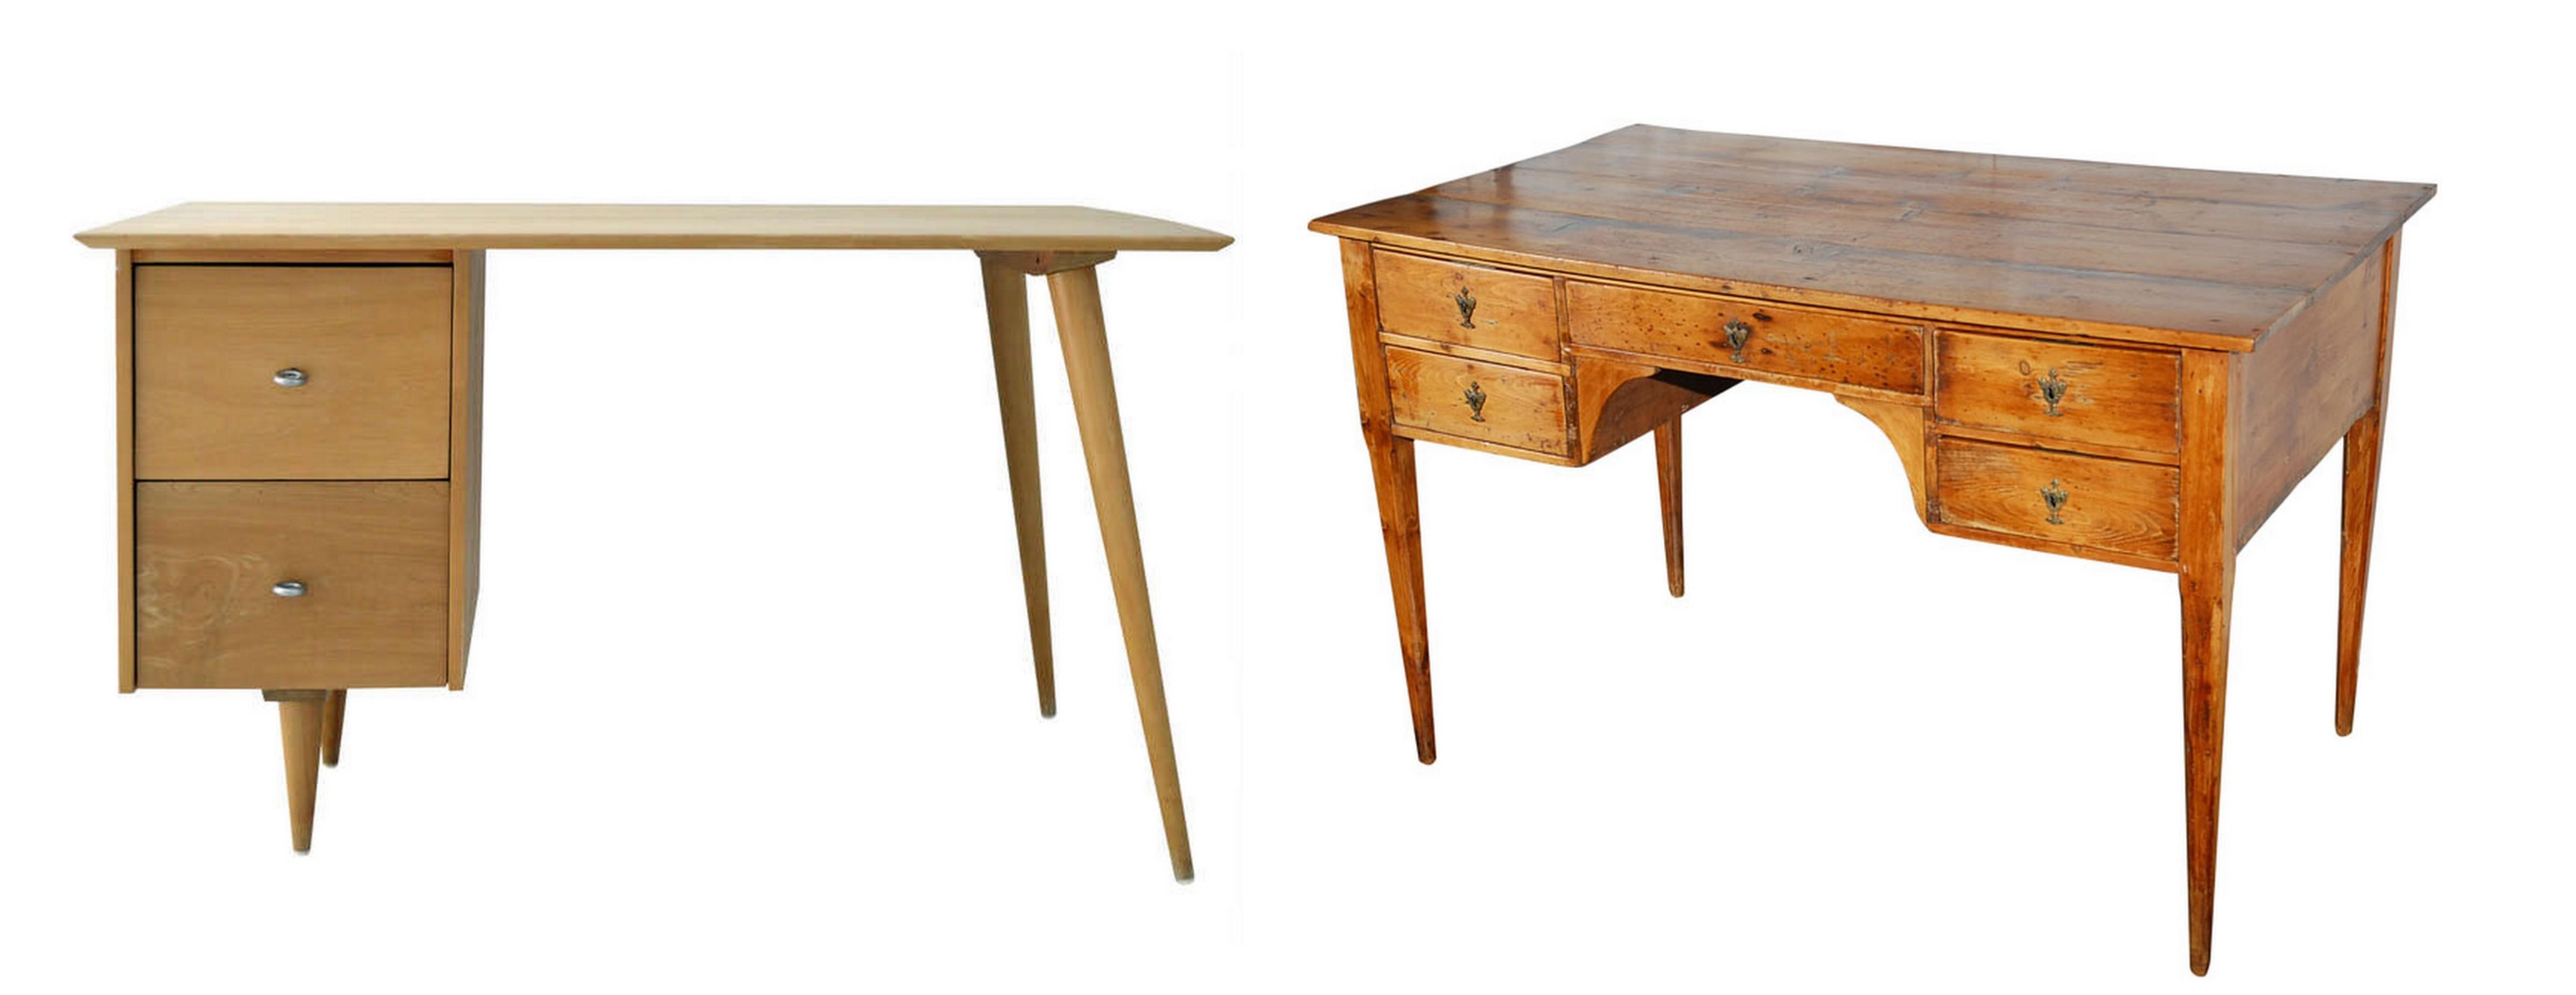 Mid Century Modern Furniture 2017 01 16 Blogimages8 Jpg